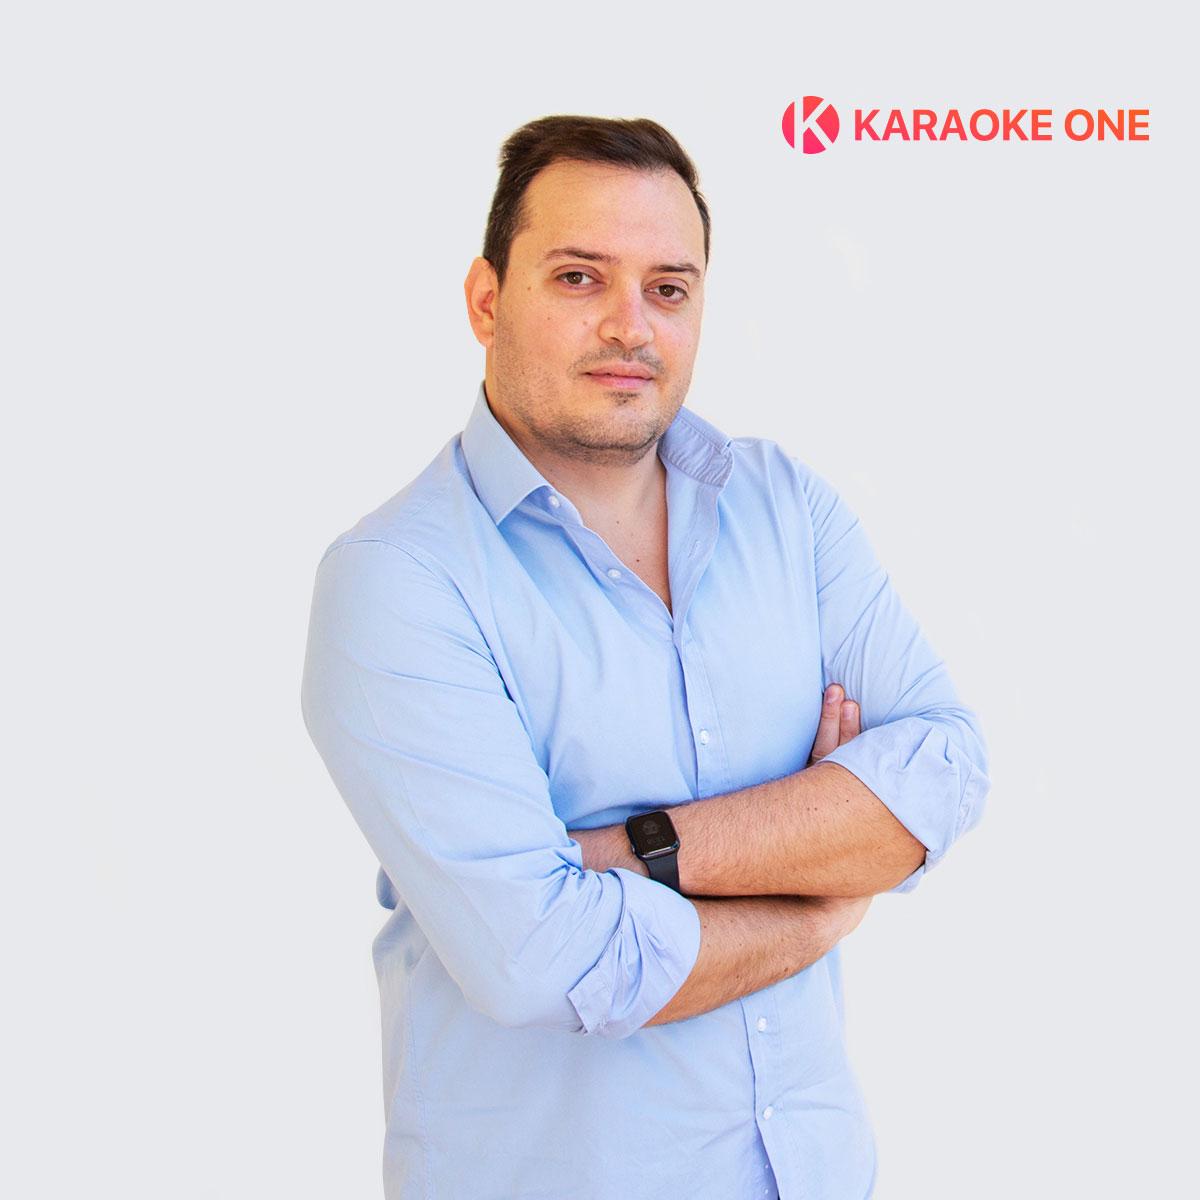 karaokeone